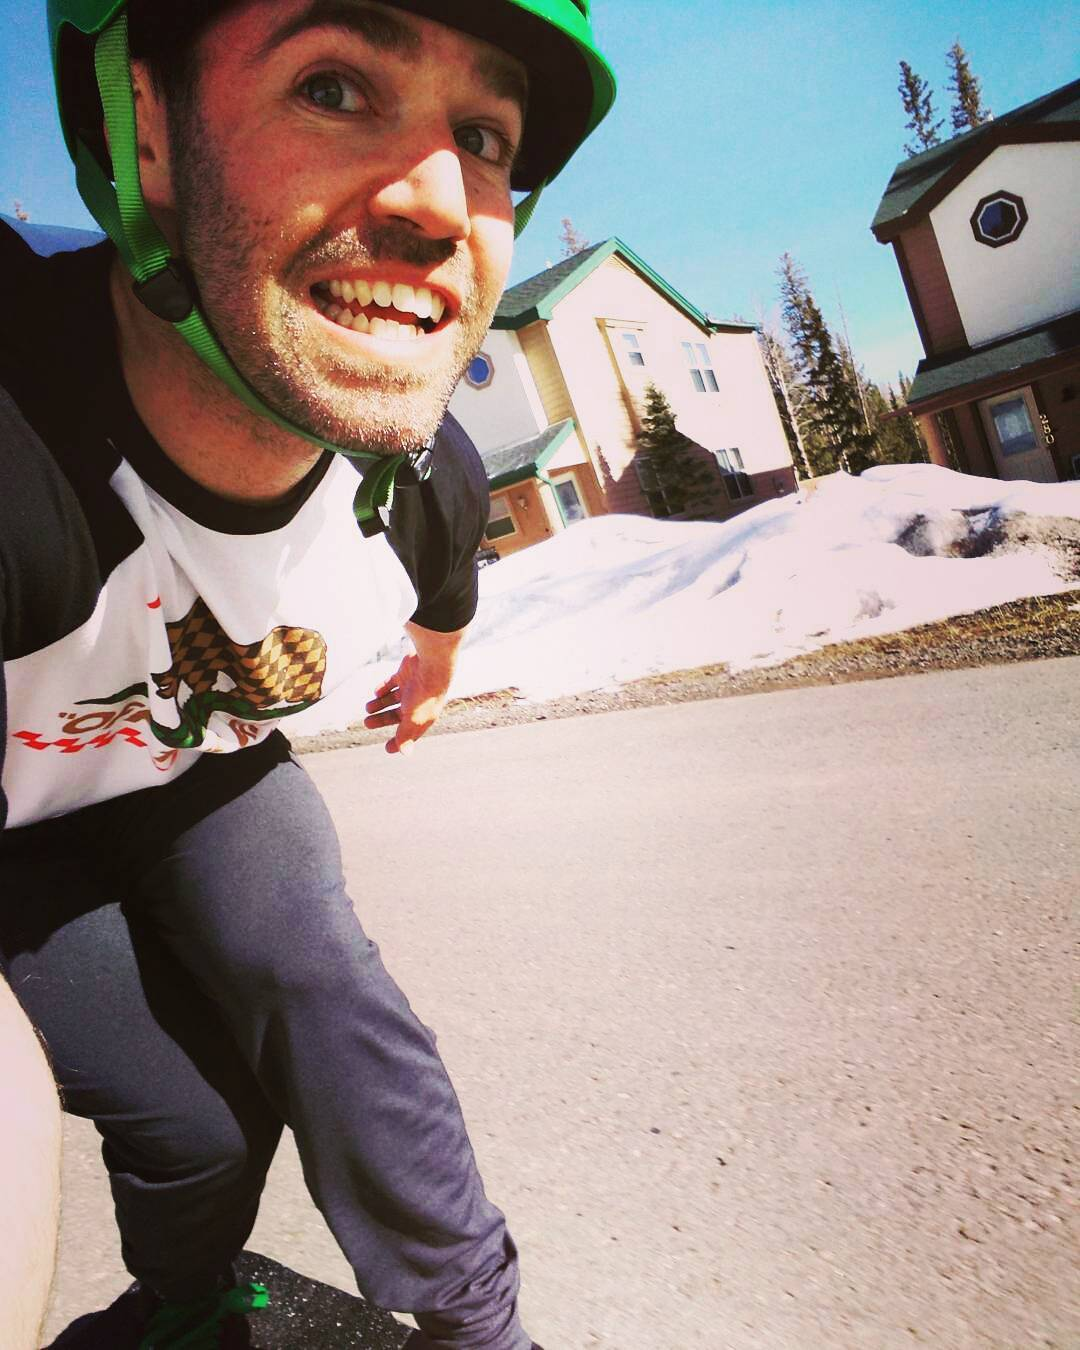 @niko_dh is enjoying the sunshine and is back on board! #selfie #melting #FR7 #PredatorHelmets